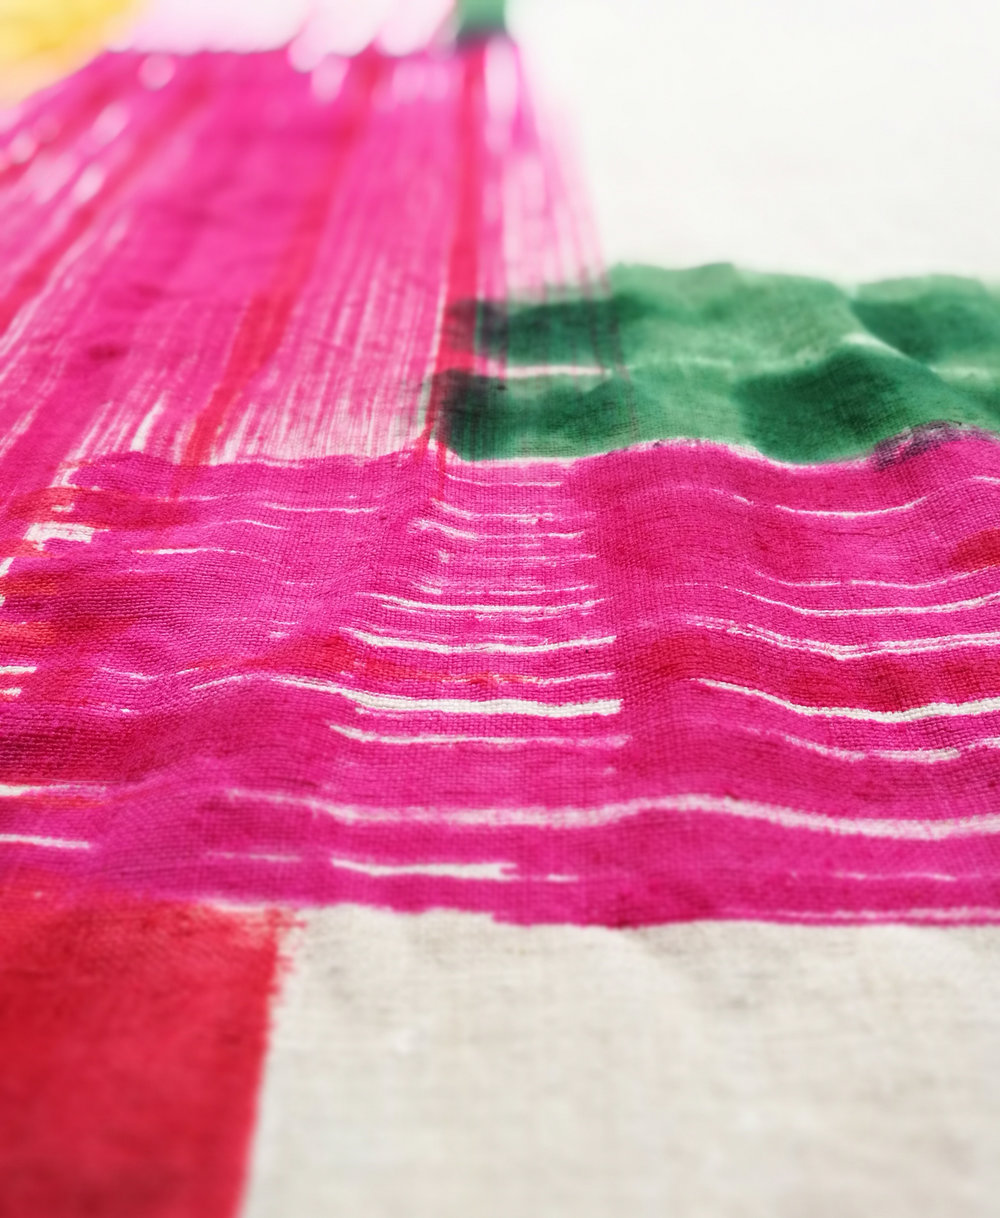 unmacello_colorful_fabric.jpg